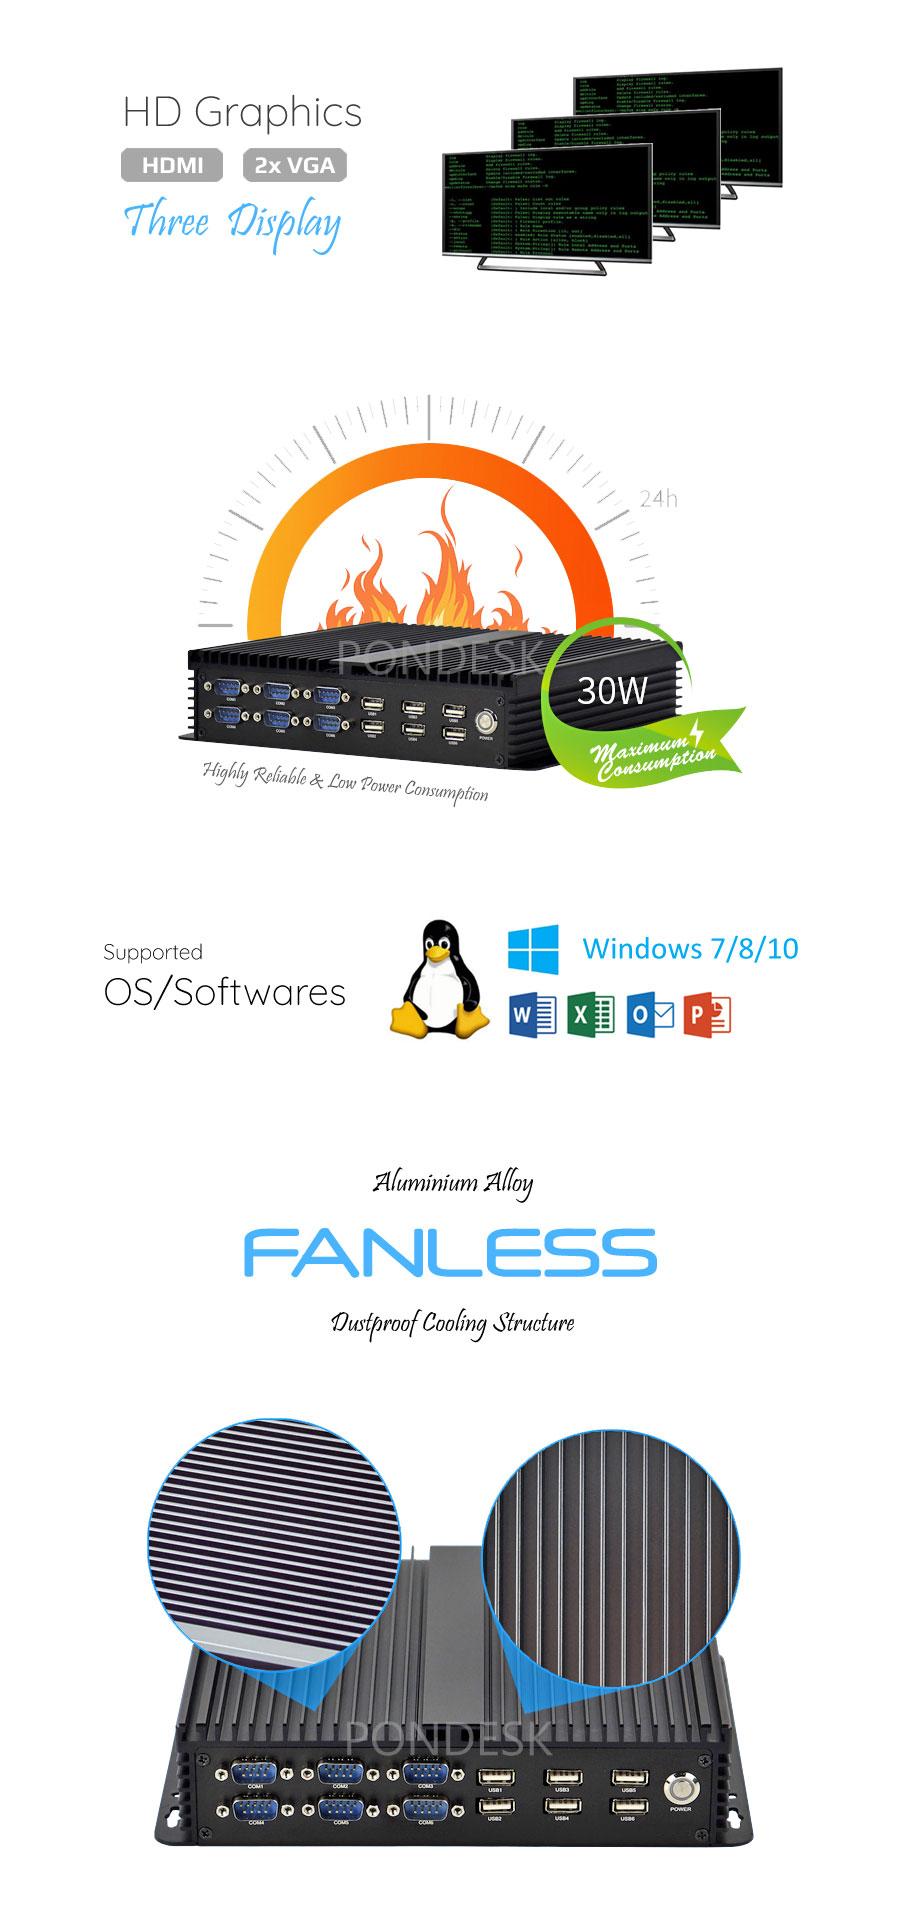 Intel® 1037U 1.80GHz GPIO 10 COM 2 LAN Fanless Industrial PC - MNHO-064 | Image